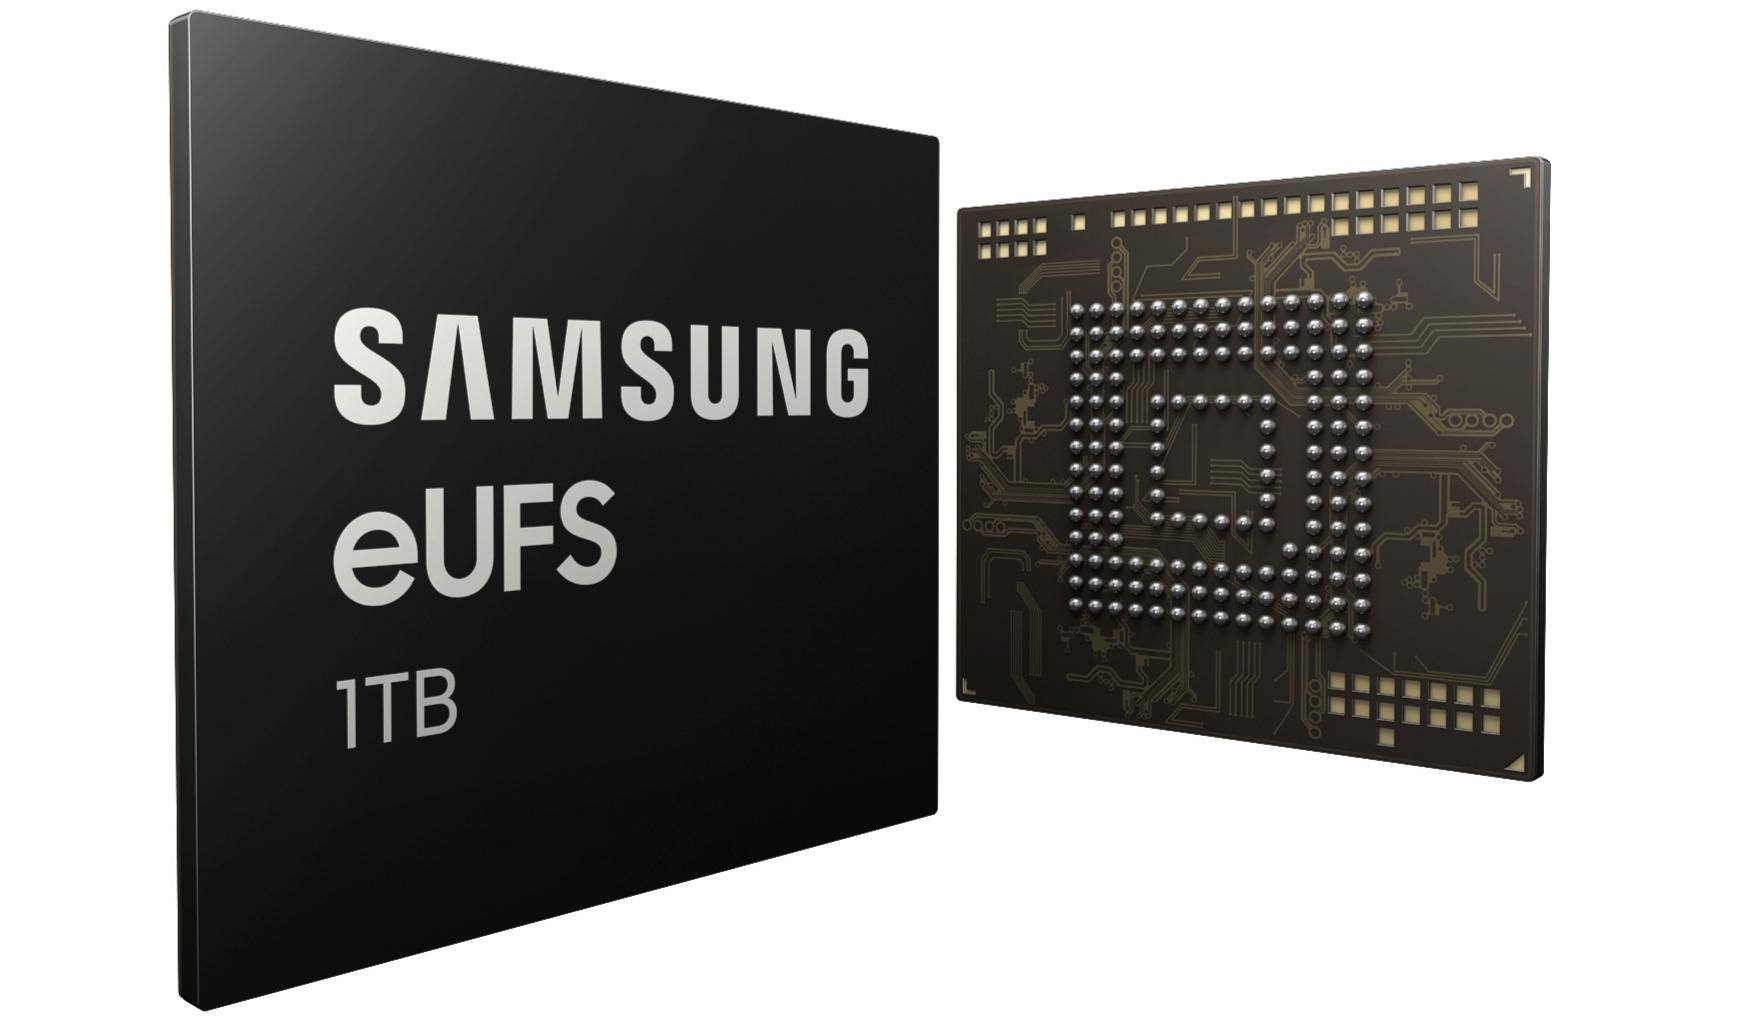 Samsung-1TB-Flash-memory-chip